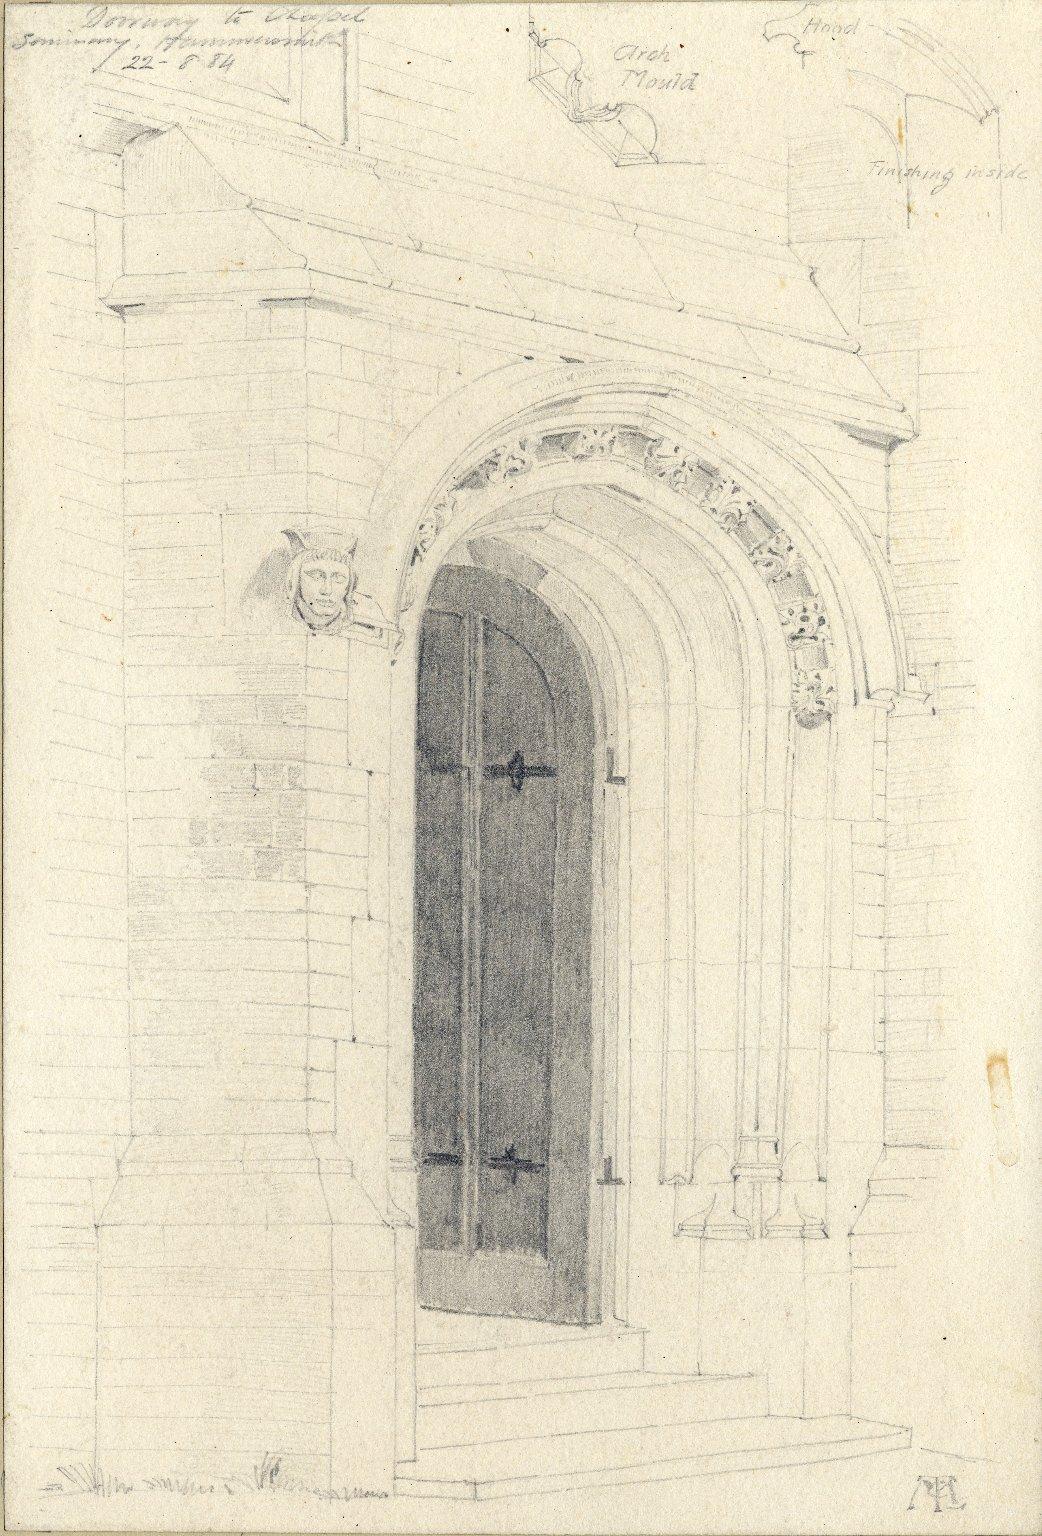 Doorway to chapel at Hammersmith seminary